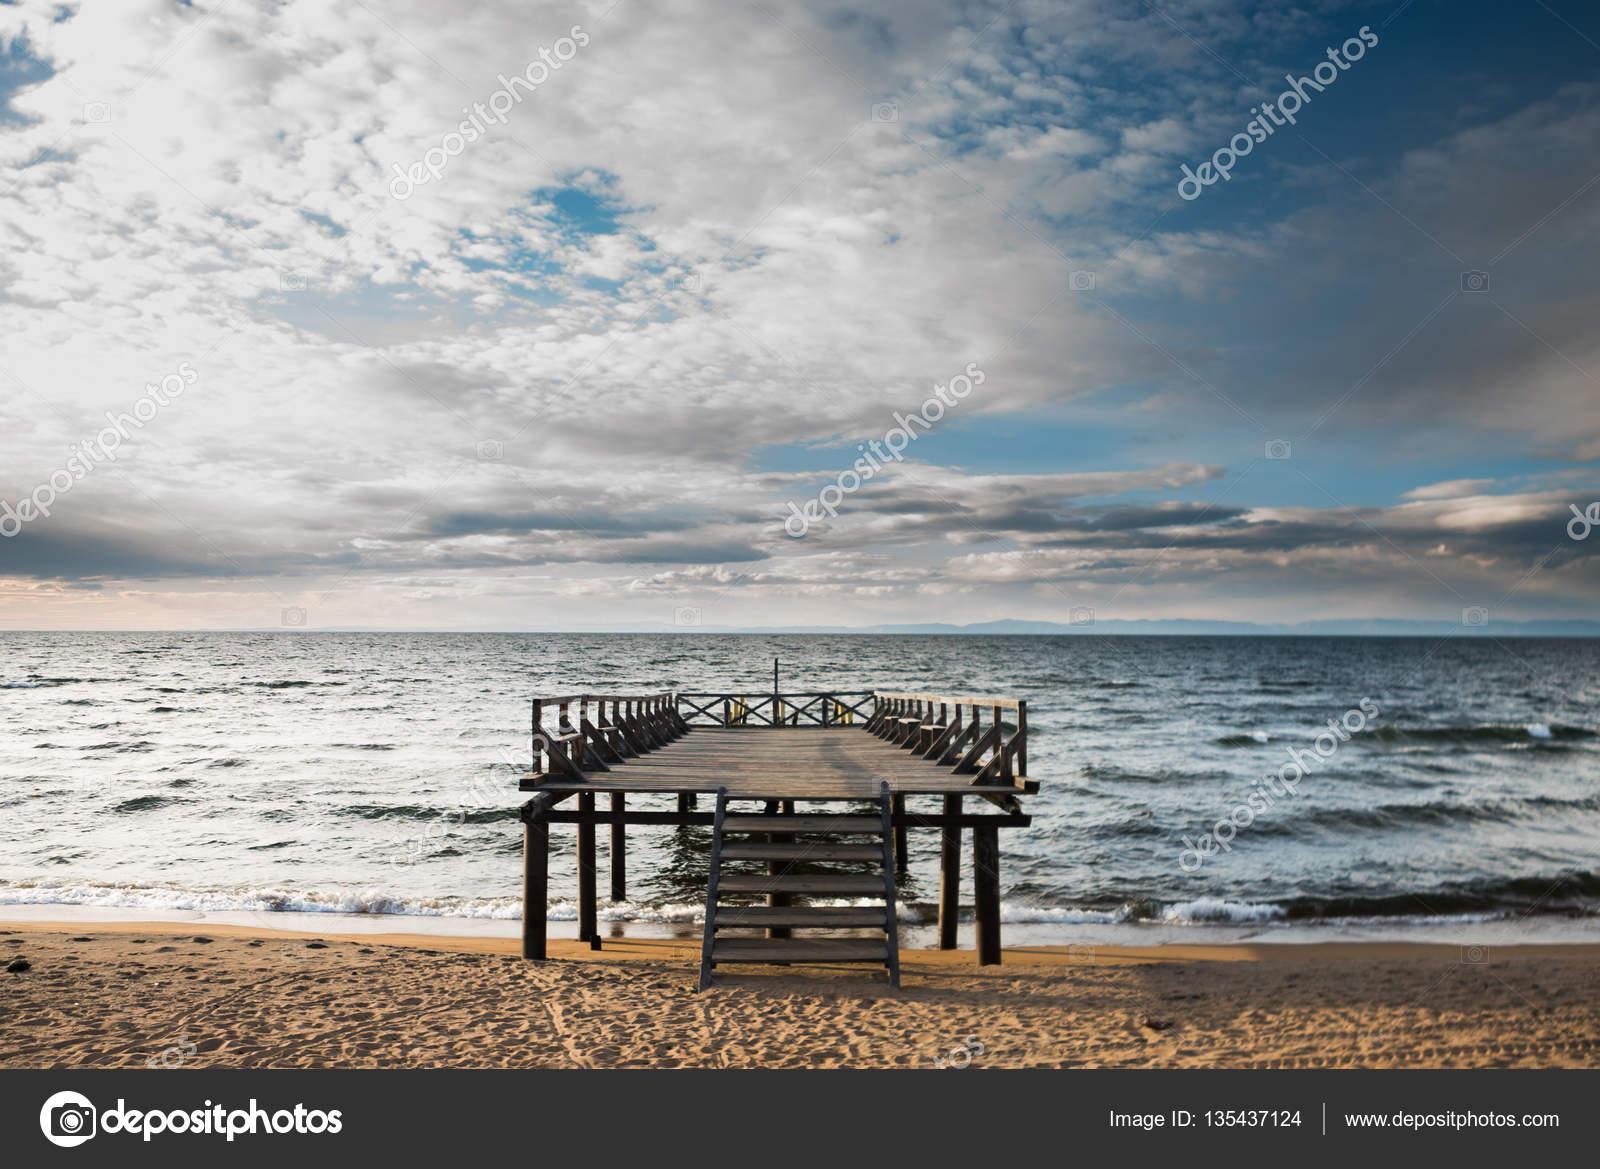 Pier on a sea